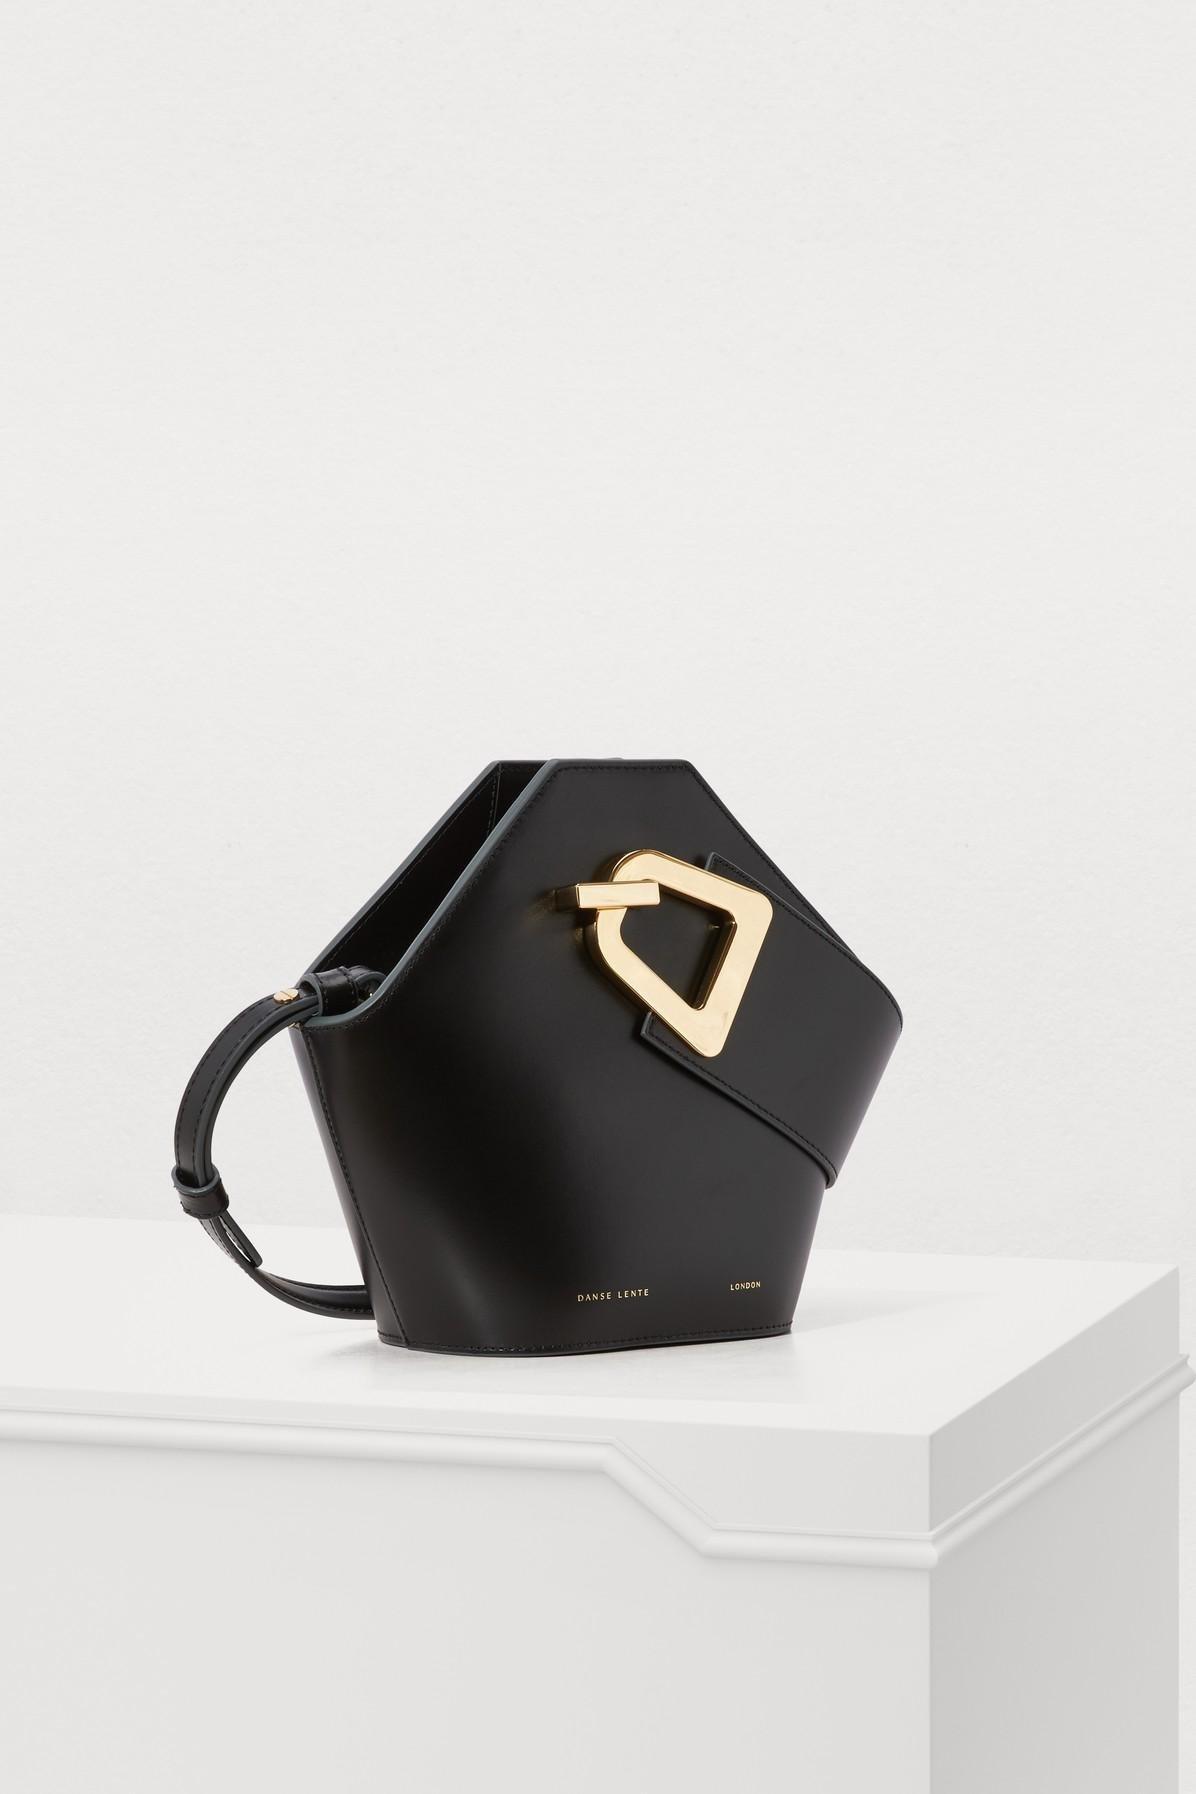 25460c15eae8 Danse Lente - Mini Johnny Bucket Bag In Black Leather - Lyst. View  fullscreen